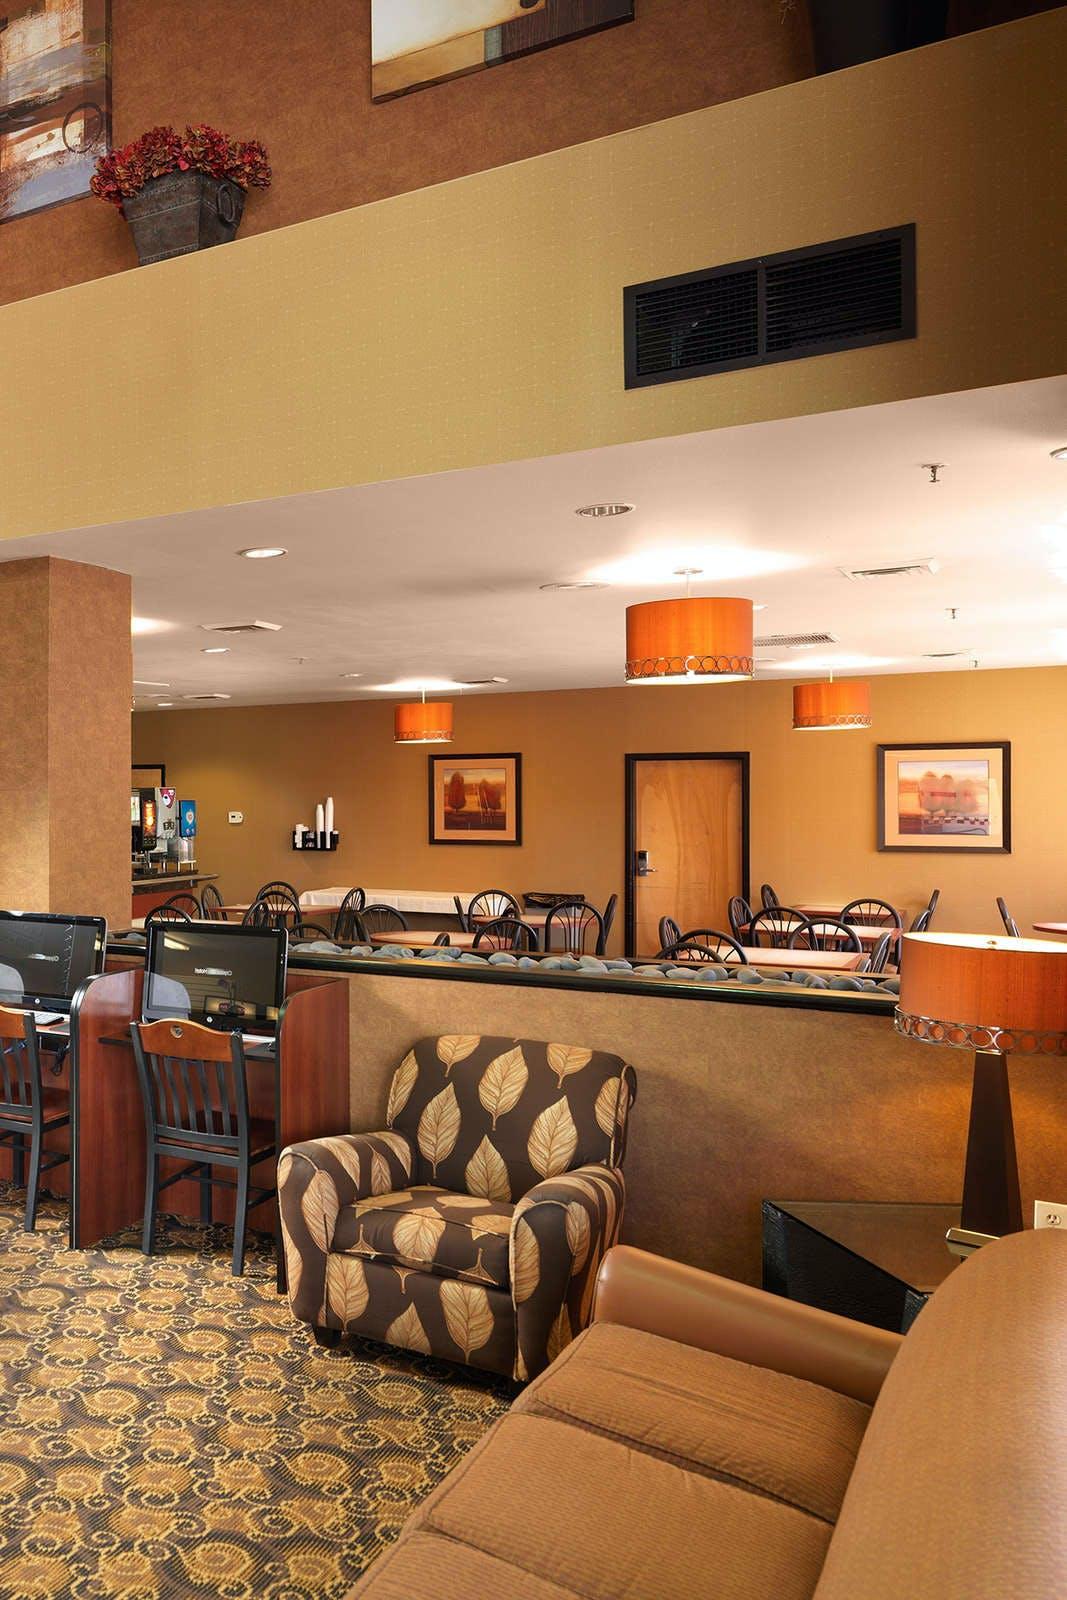 Crystal Inn Hotel & Suites West Valley City